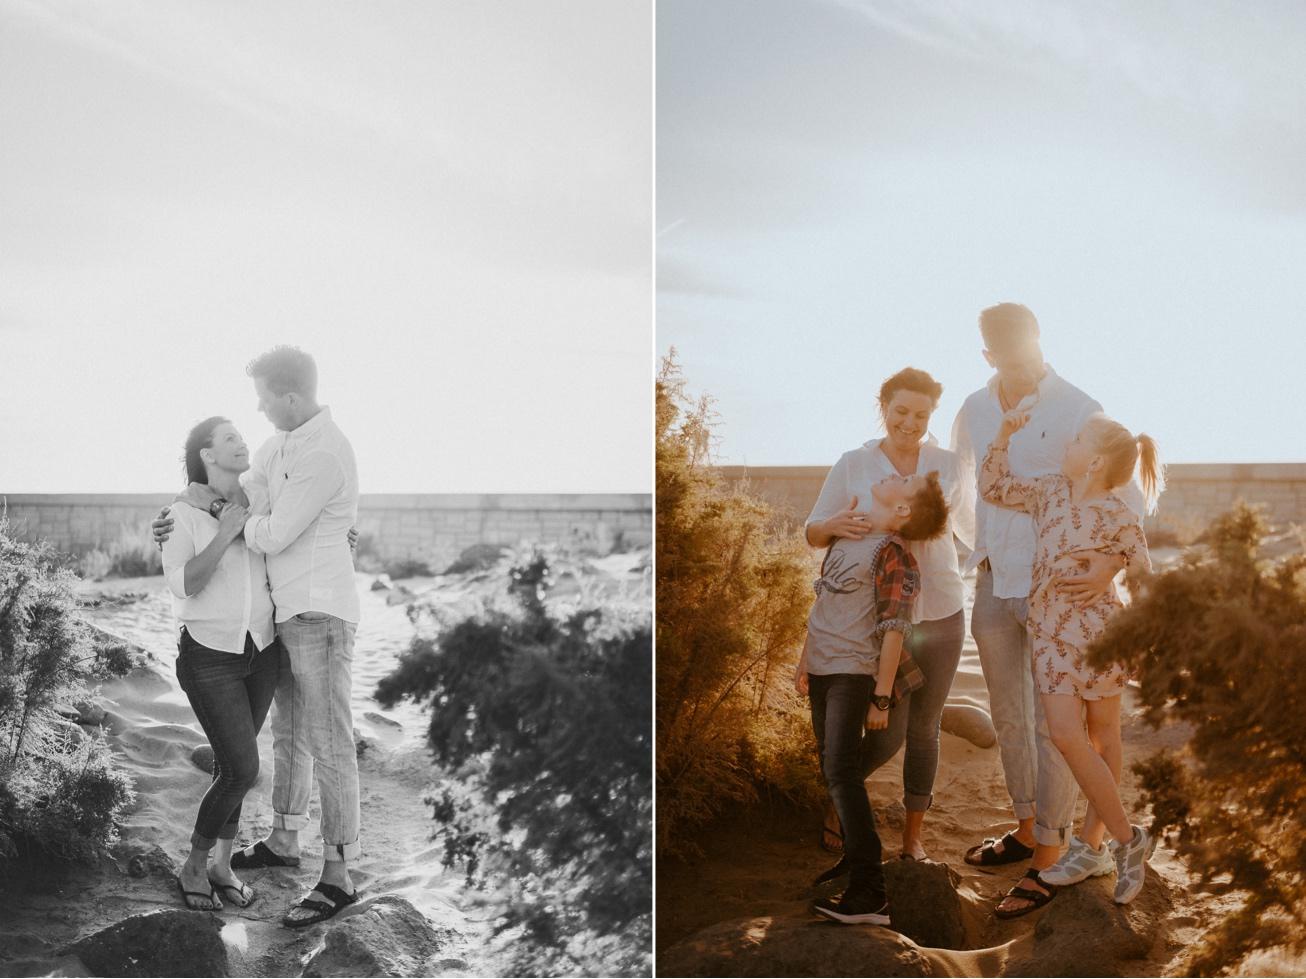 Gran Canaria Maspalomas Canaria Canaries Wedding Family Photographer 20